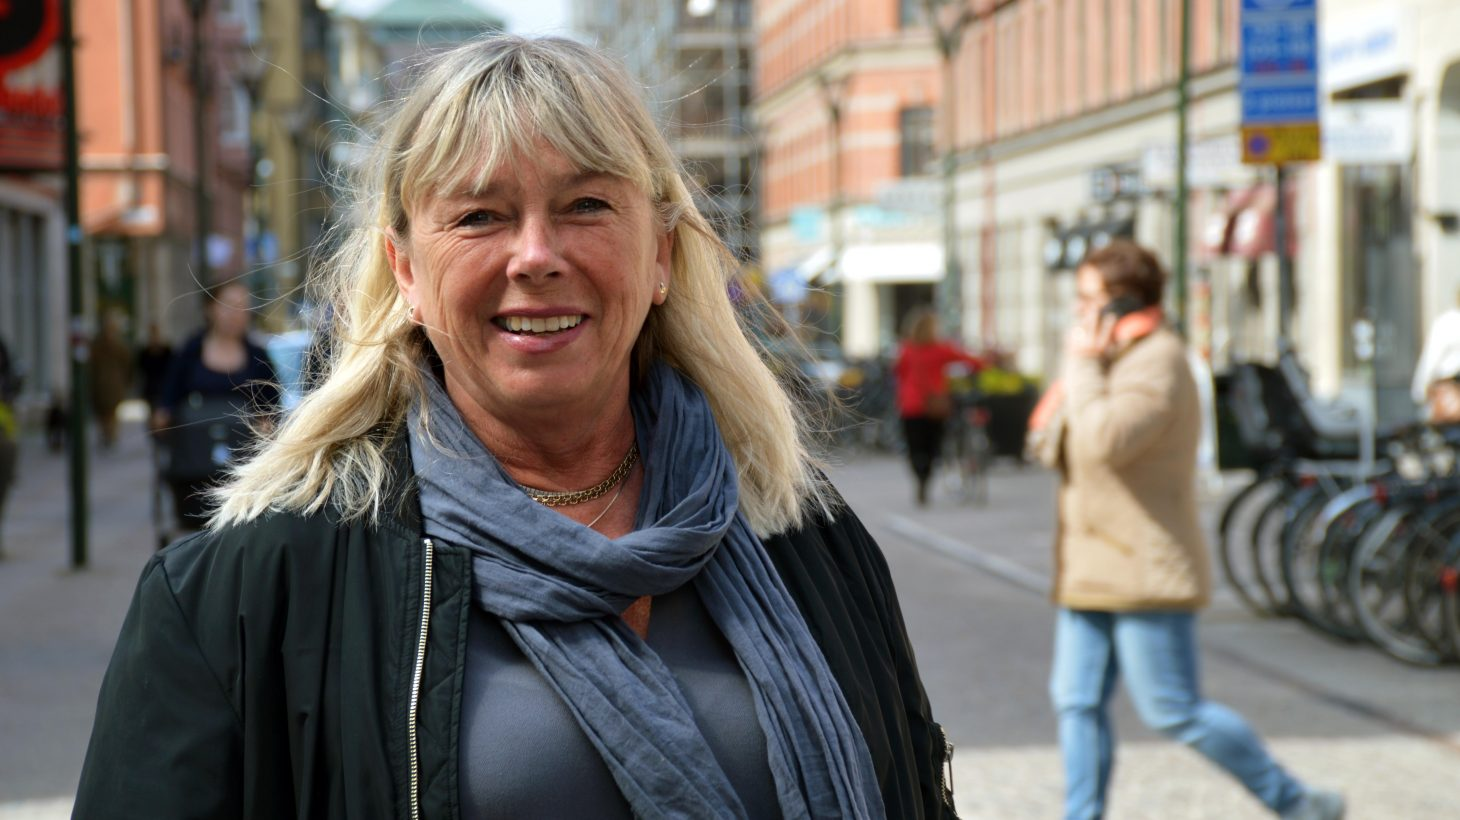 Annette Lawesson står på gåtgatan i Malmö